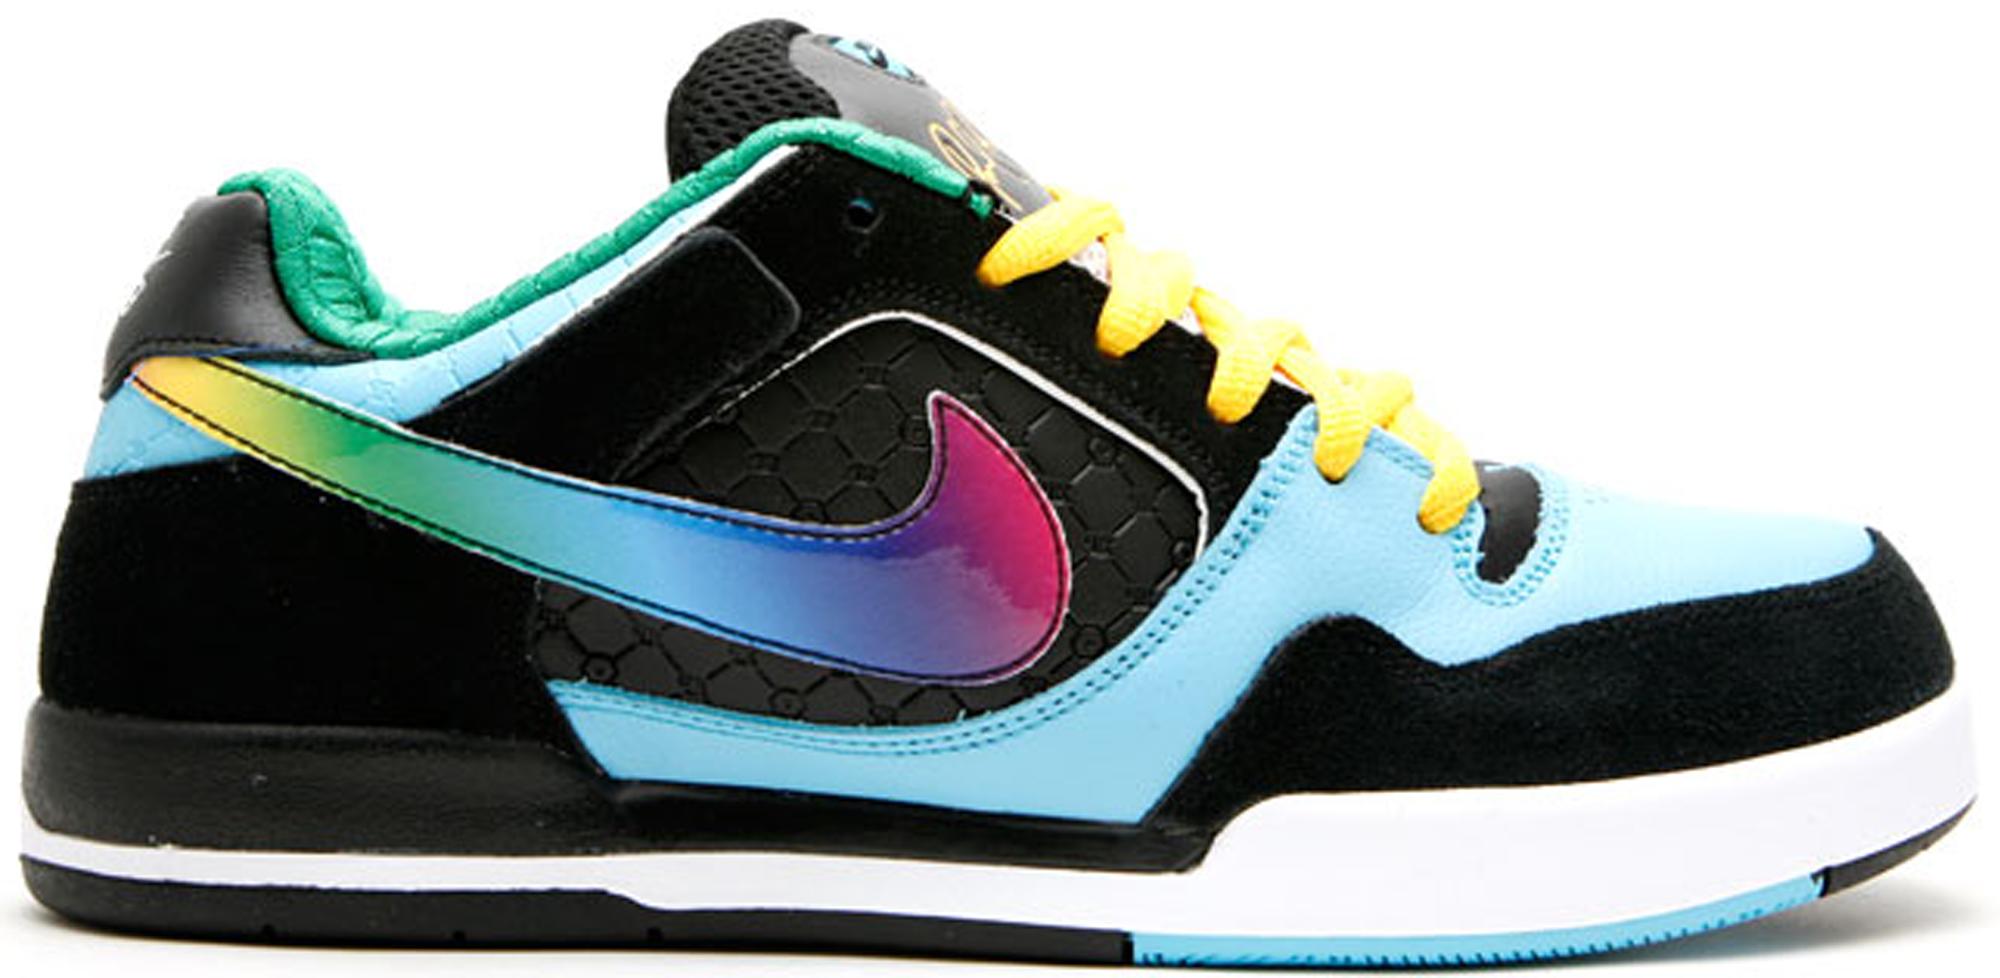 Nike SB Paul Rodriguez 2 Playstation